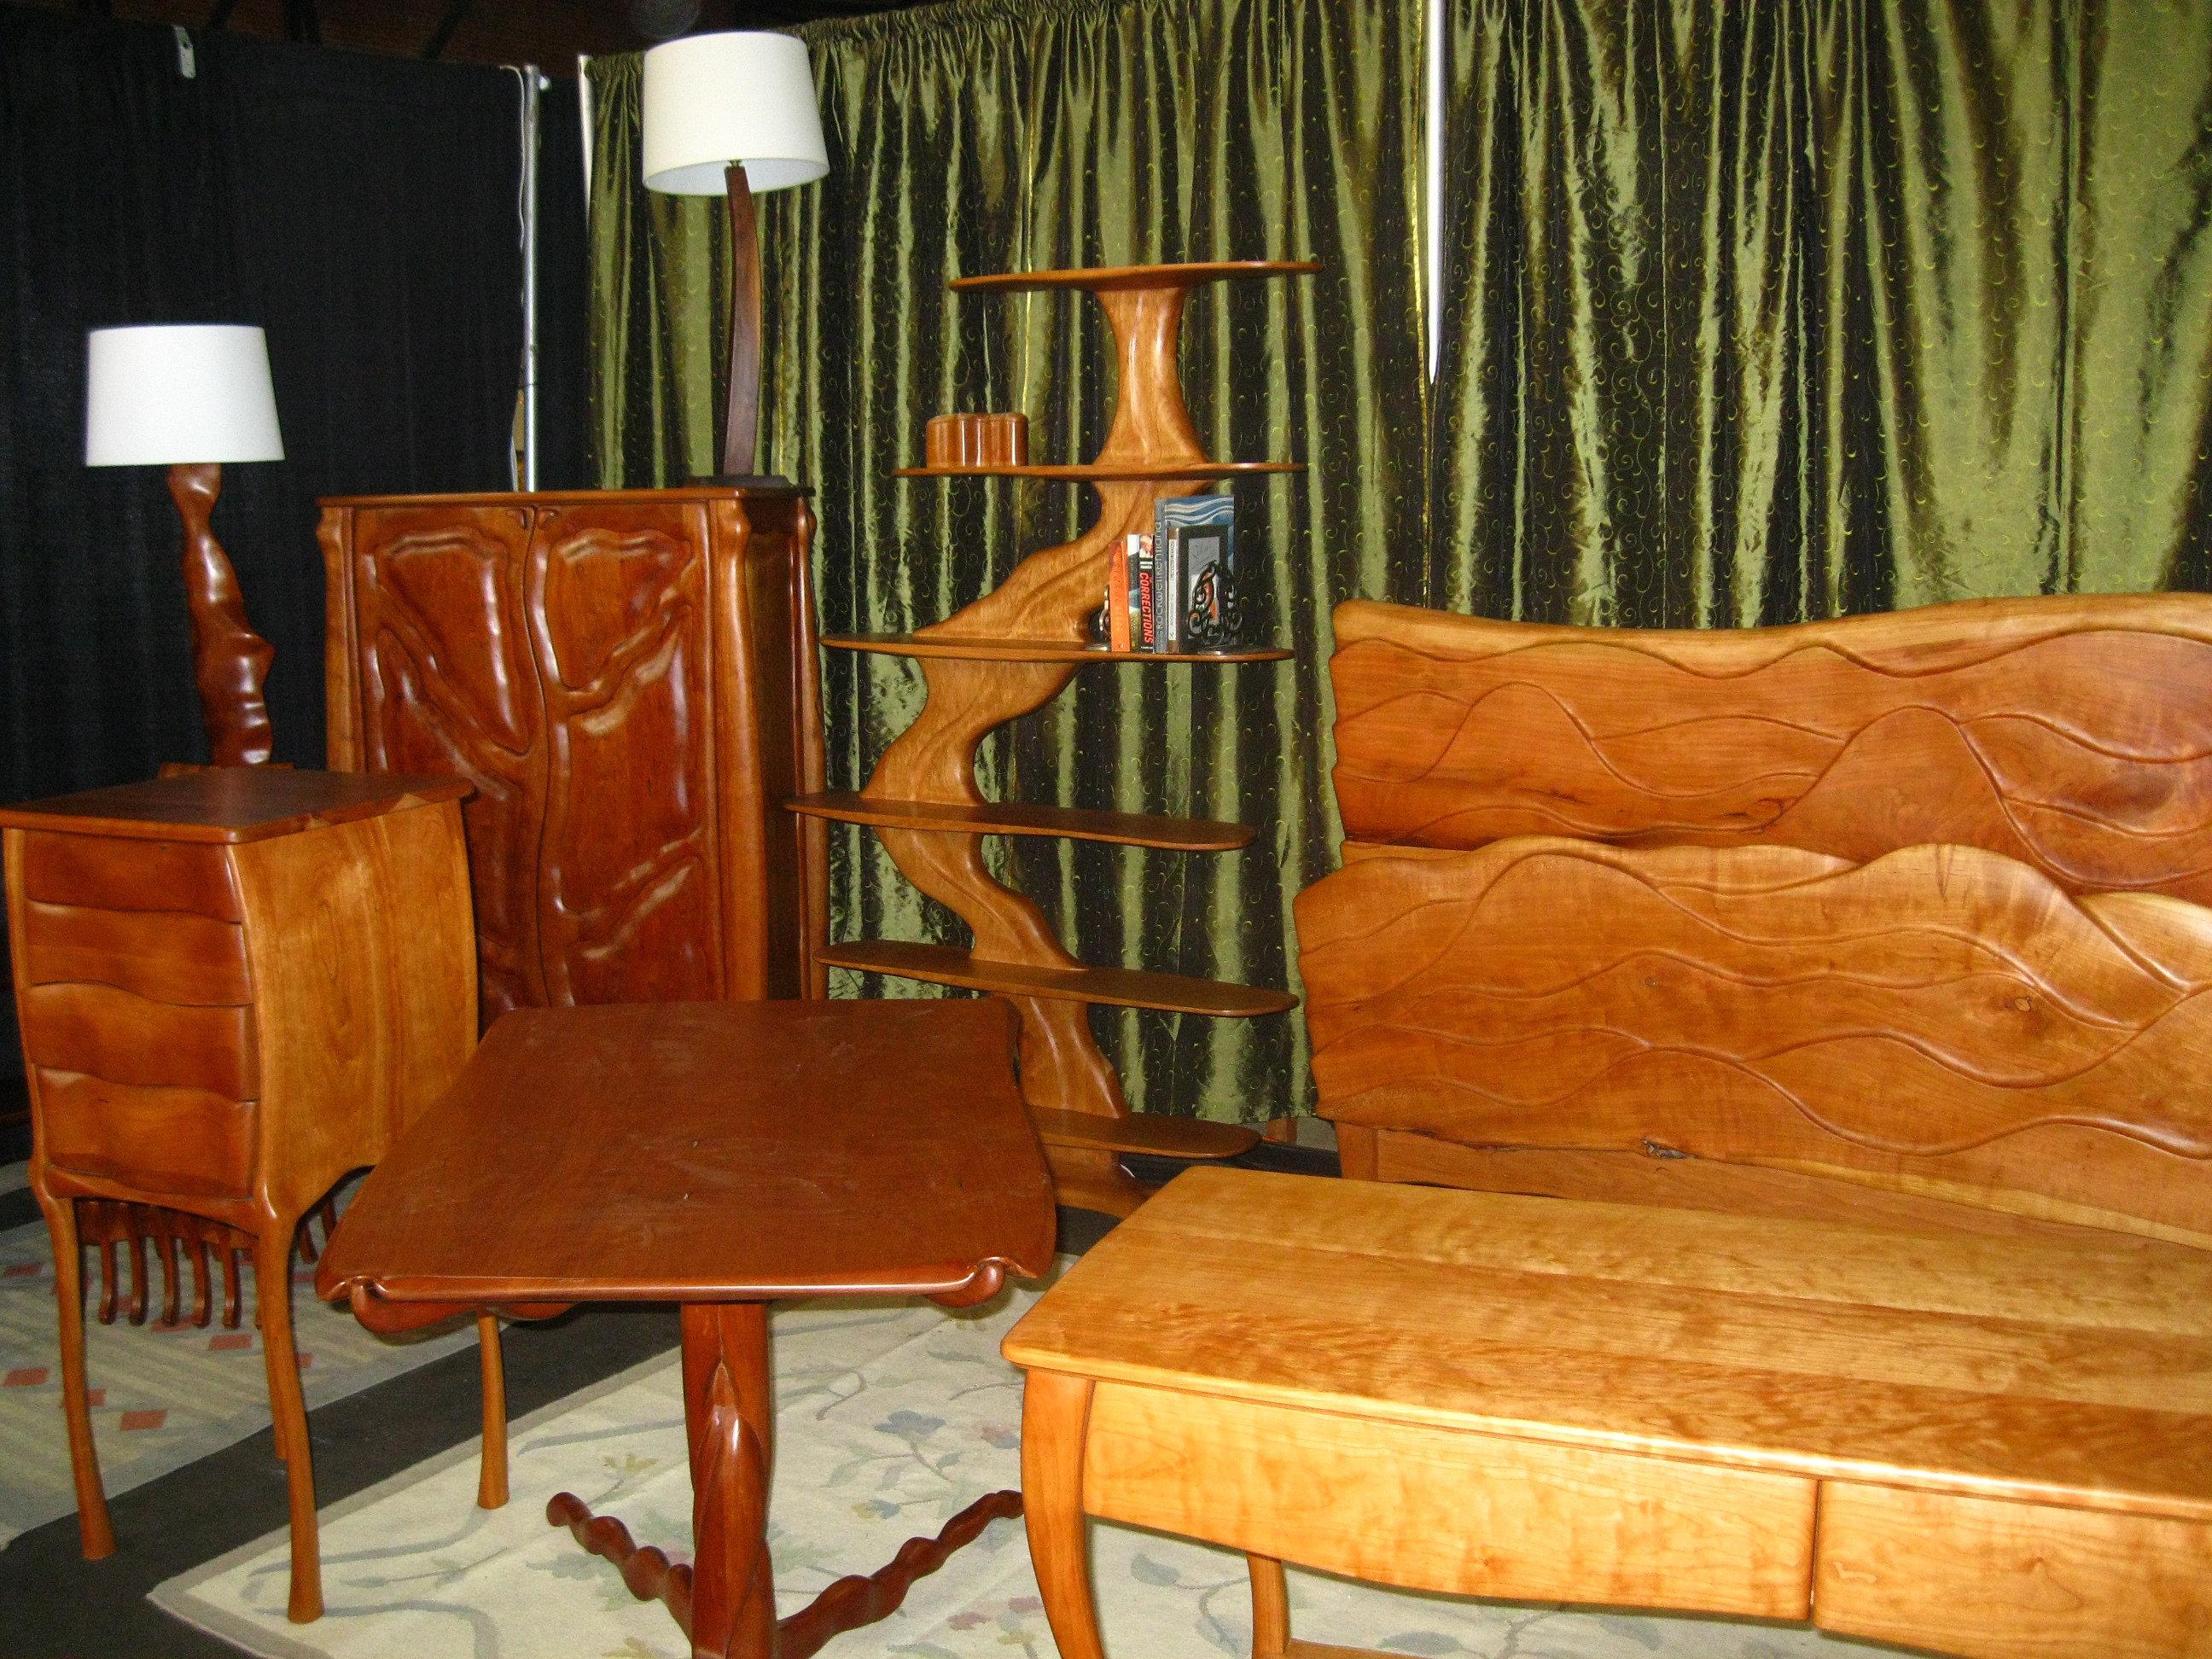 Philadelphia Furniture Show Img 0715 Jpg